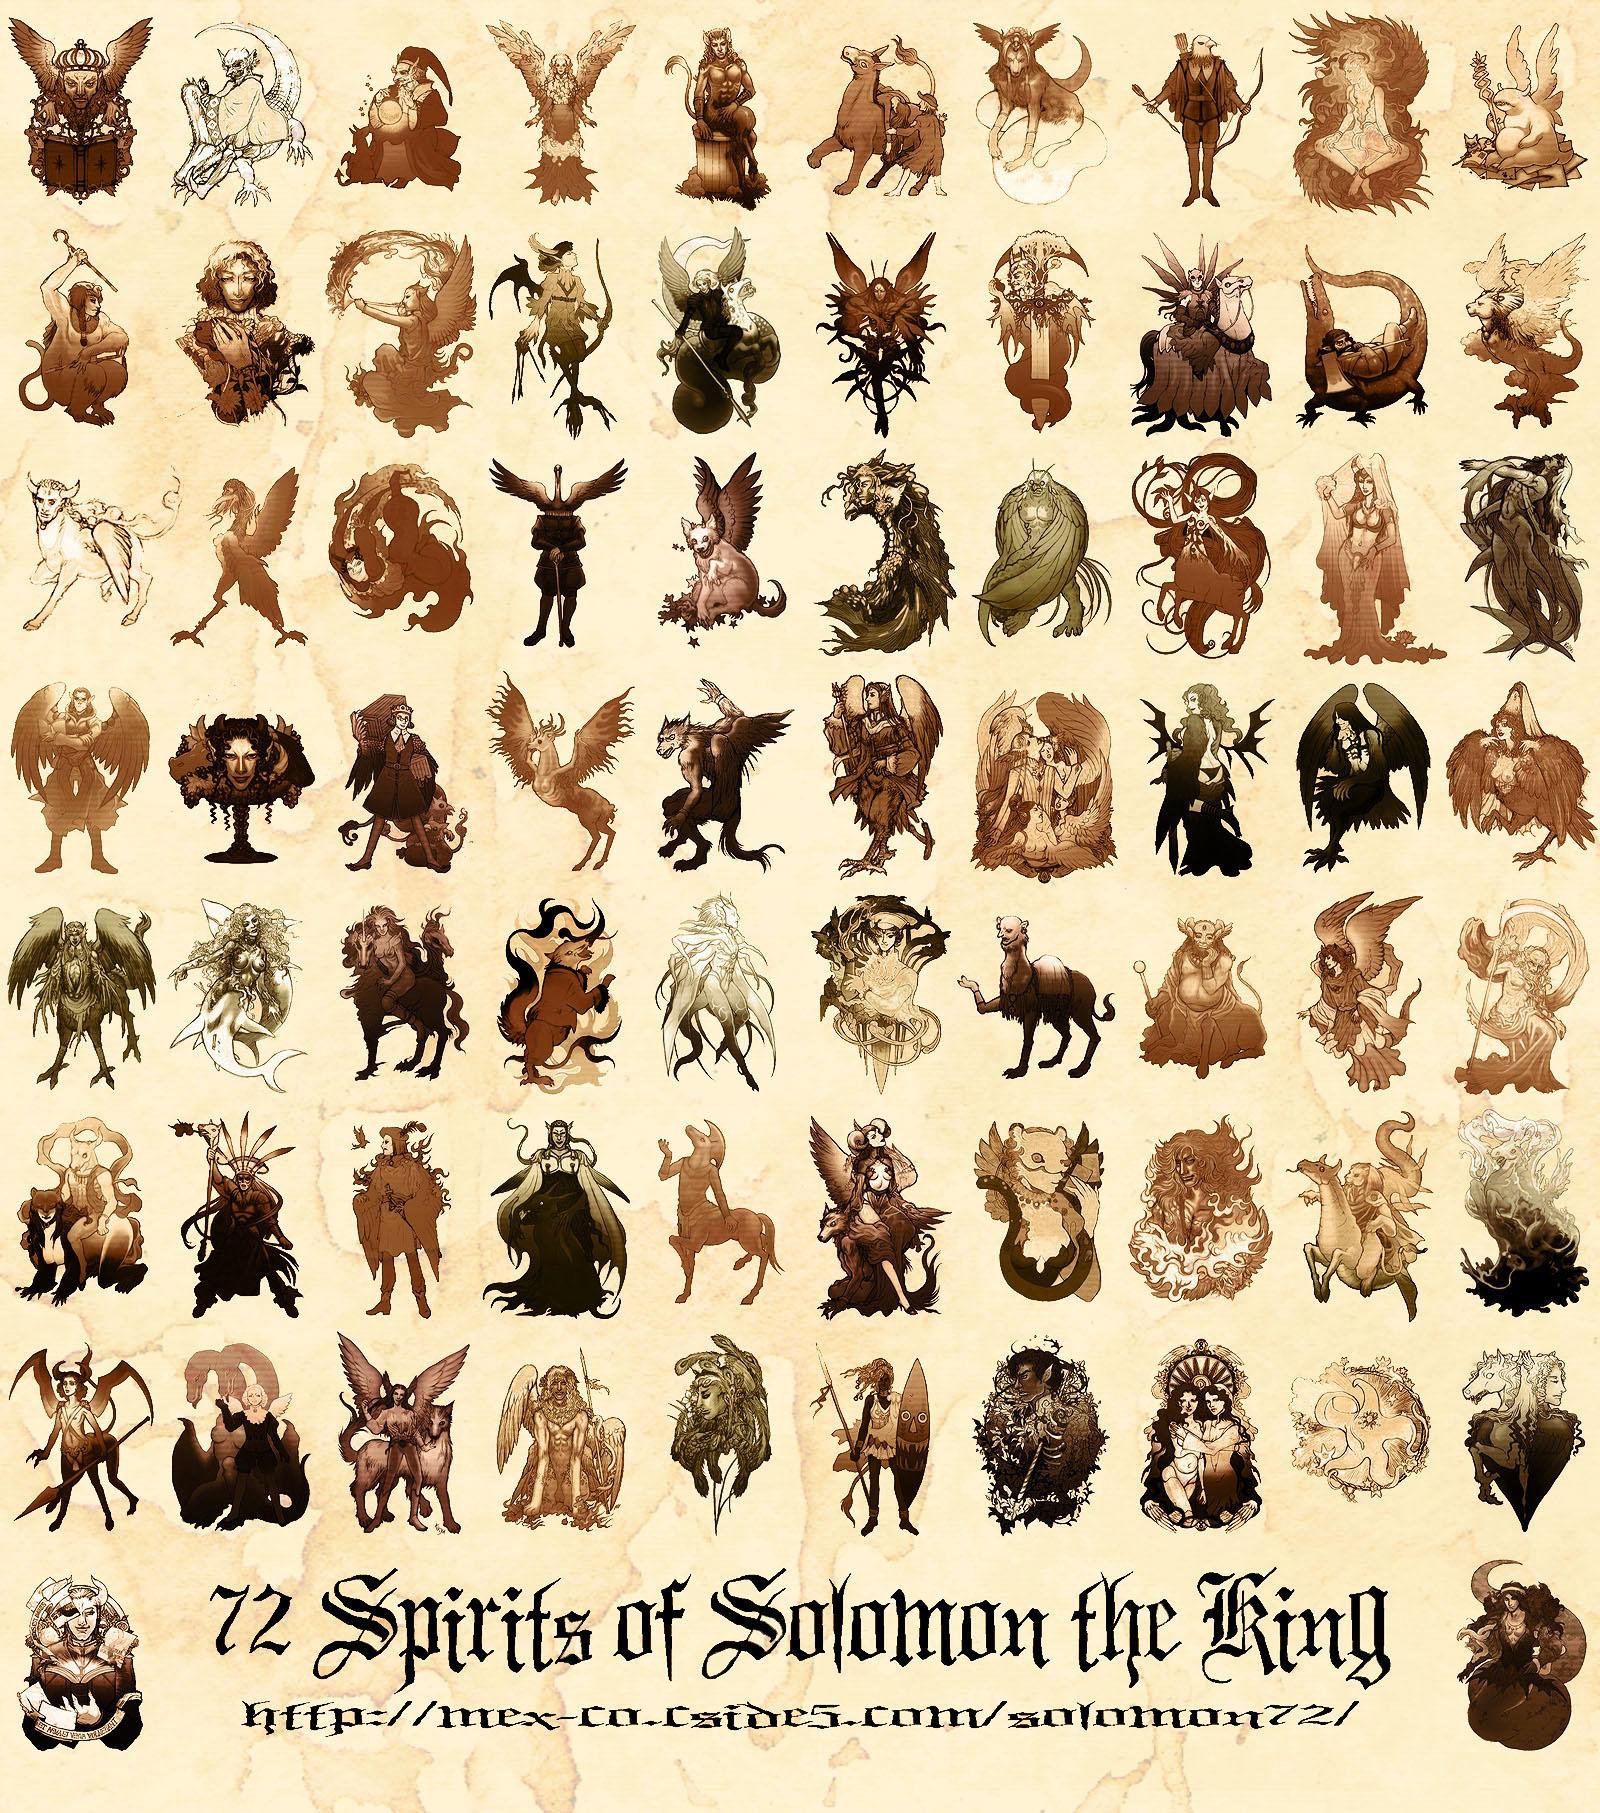 Demons of the Ars Goetia